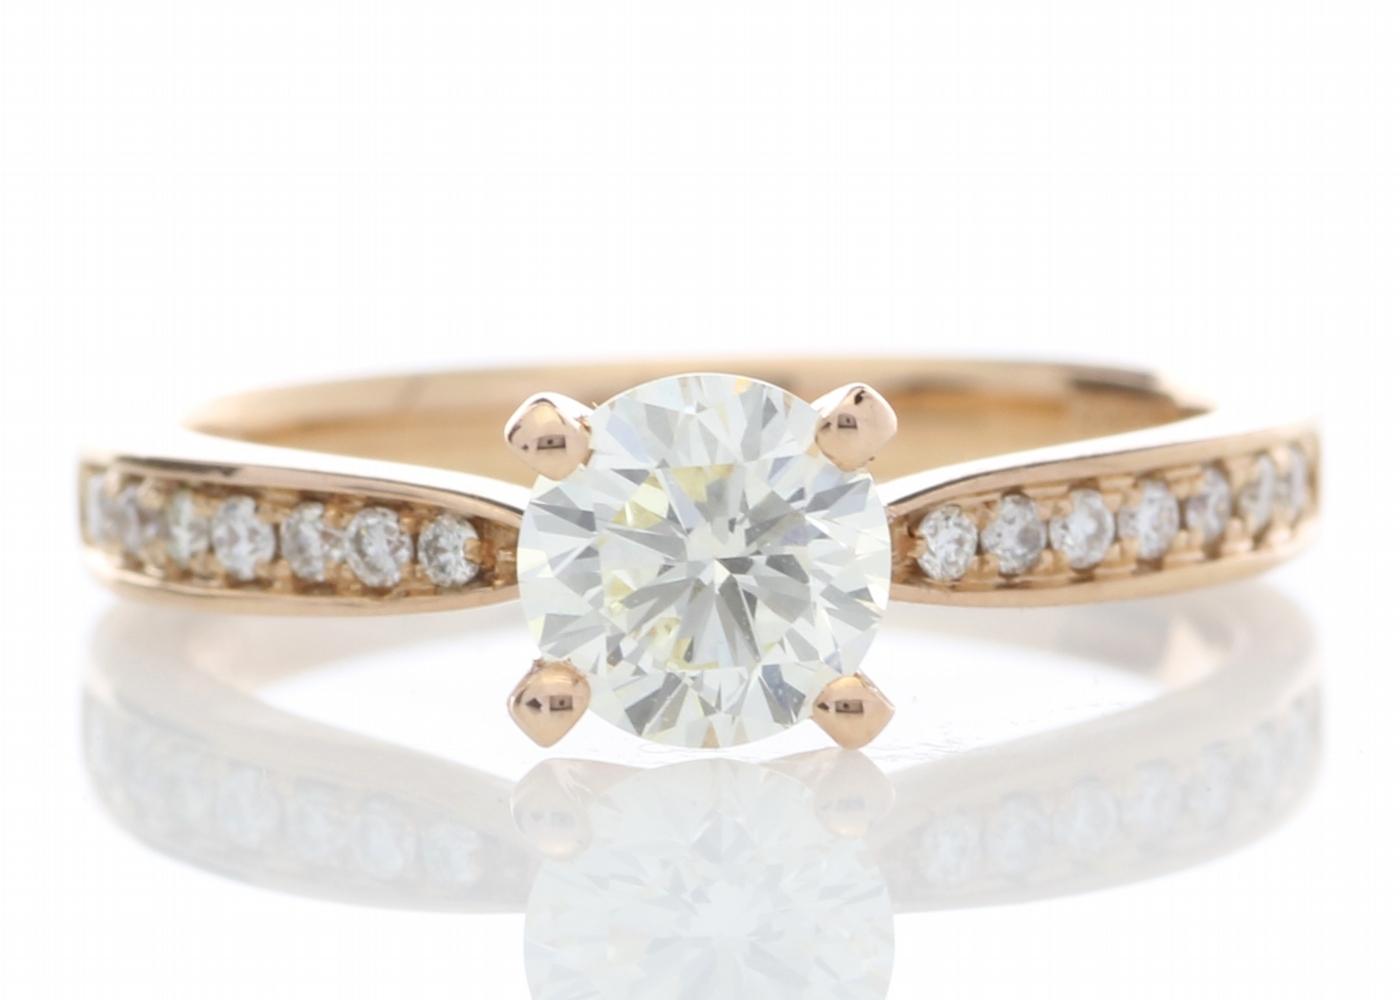 Lot 11 - 18ct Rose Gold Stone Set Shoulders Diamond Ring 0.84 Carats